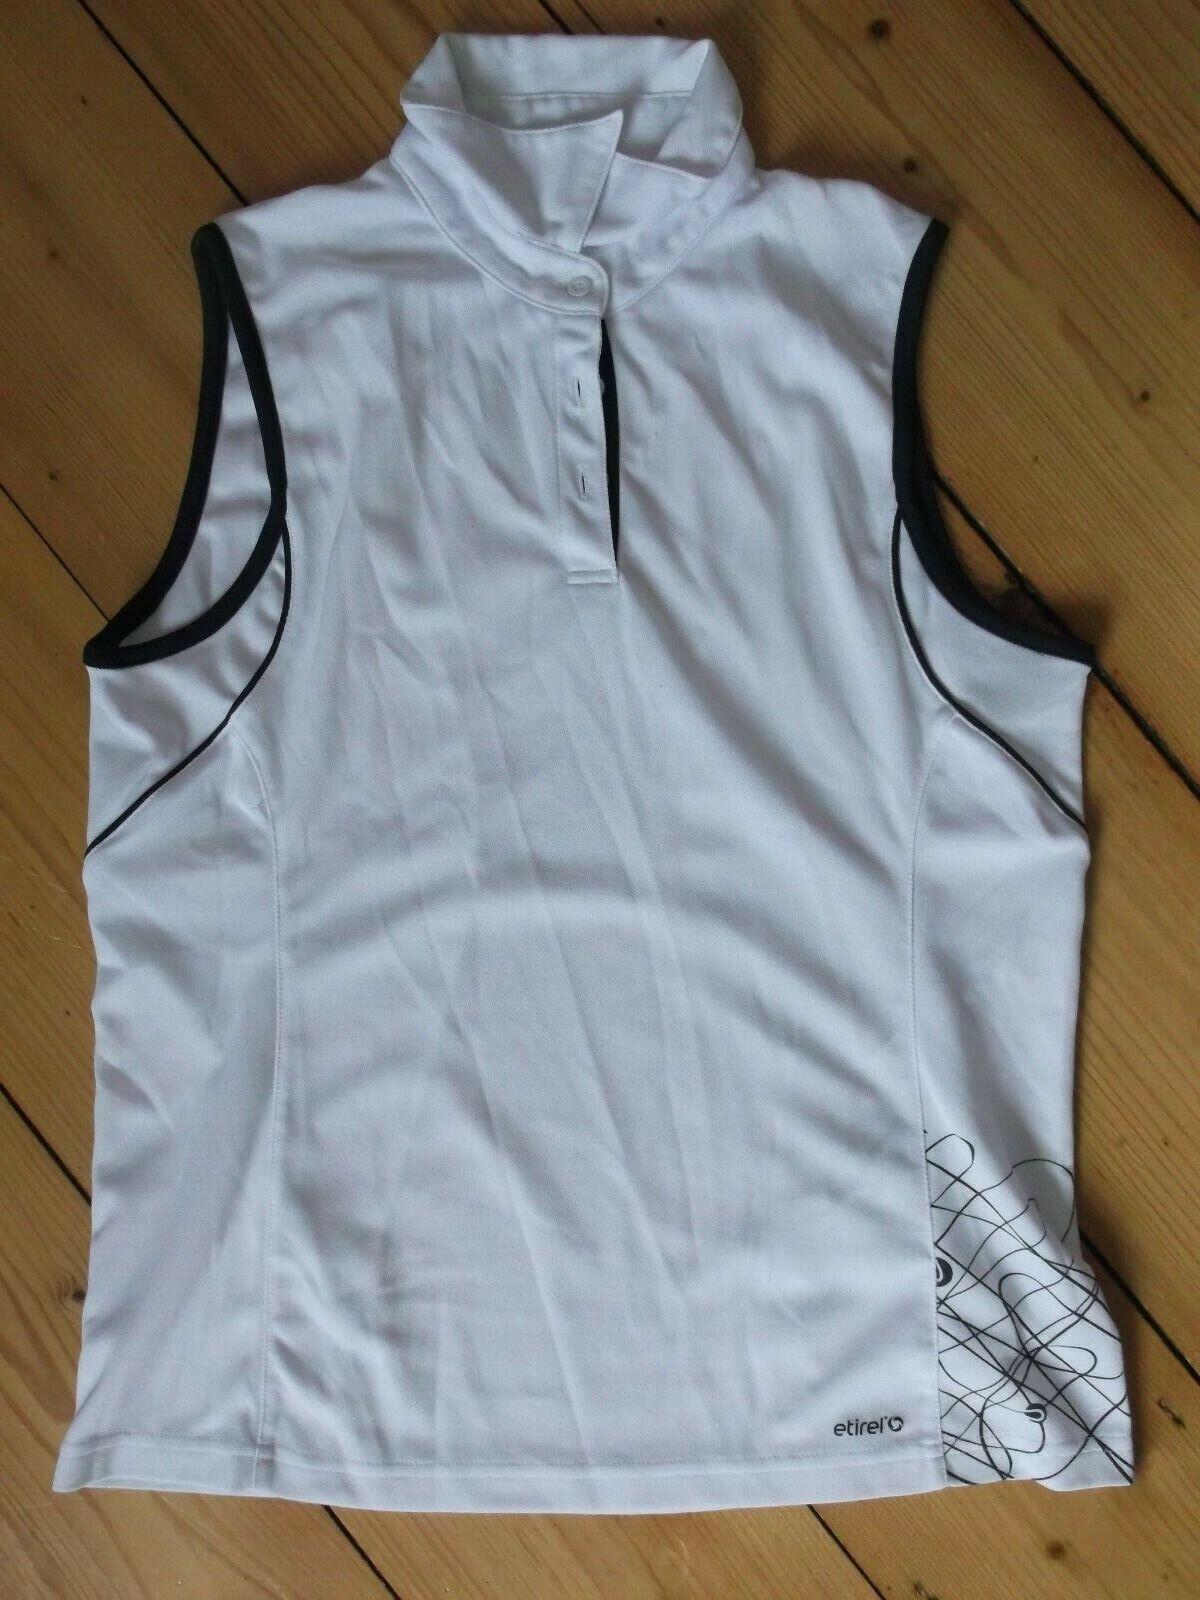 ETIREL Sports💐 Polo-Shirt 🐬 weiß m. schwarz ** Gr. 40 // Super 😊 Cool